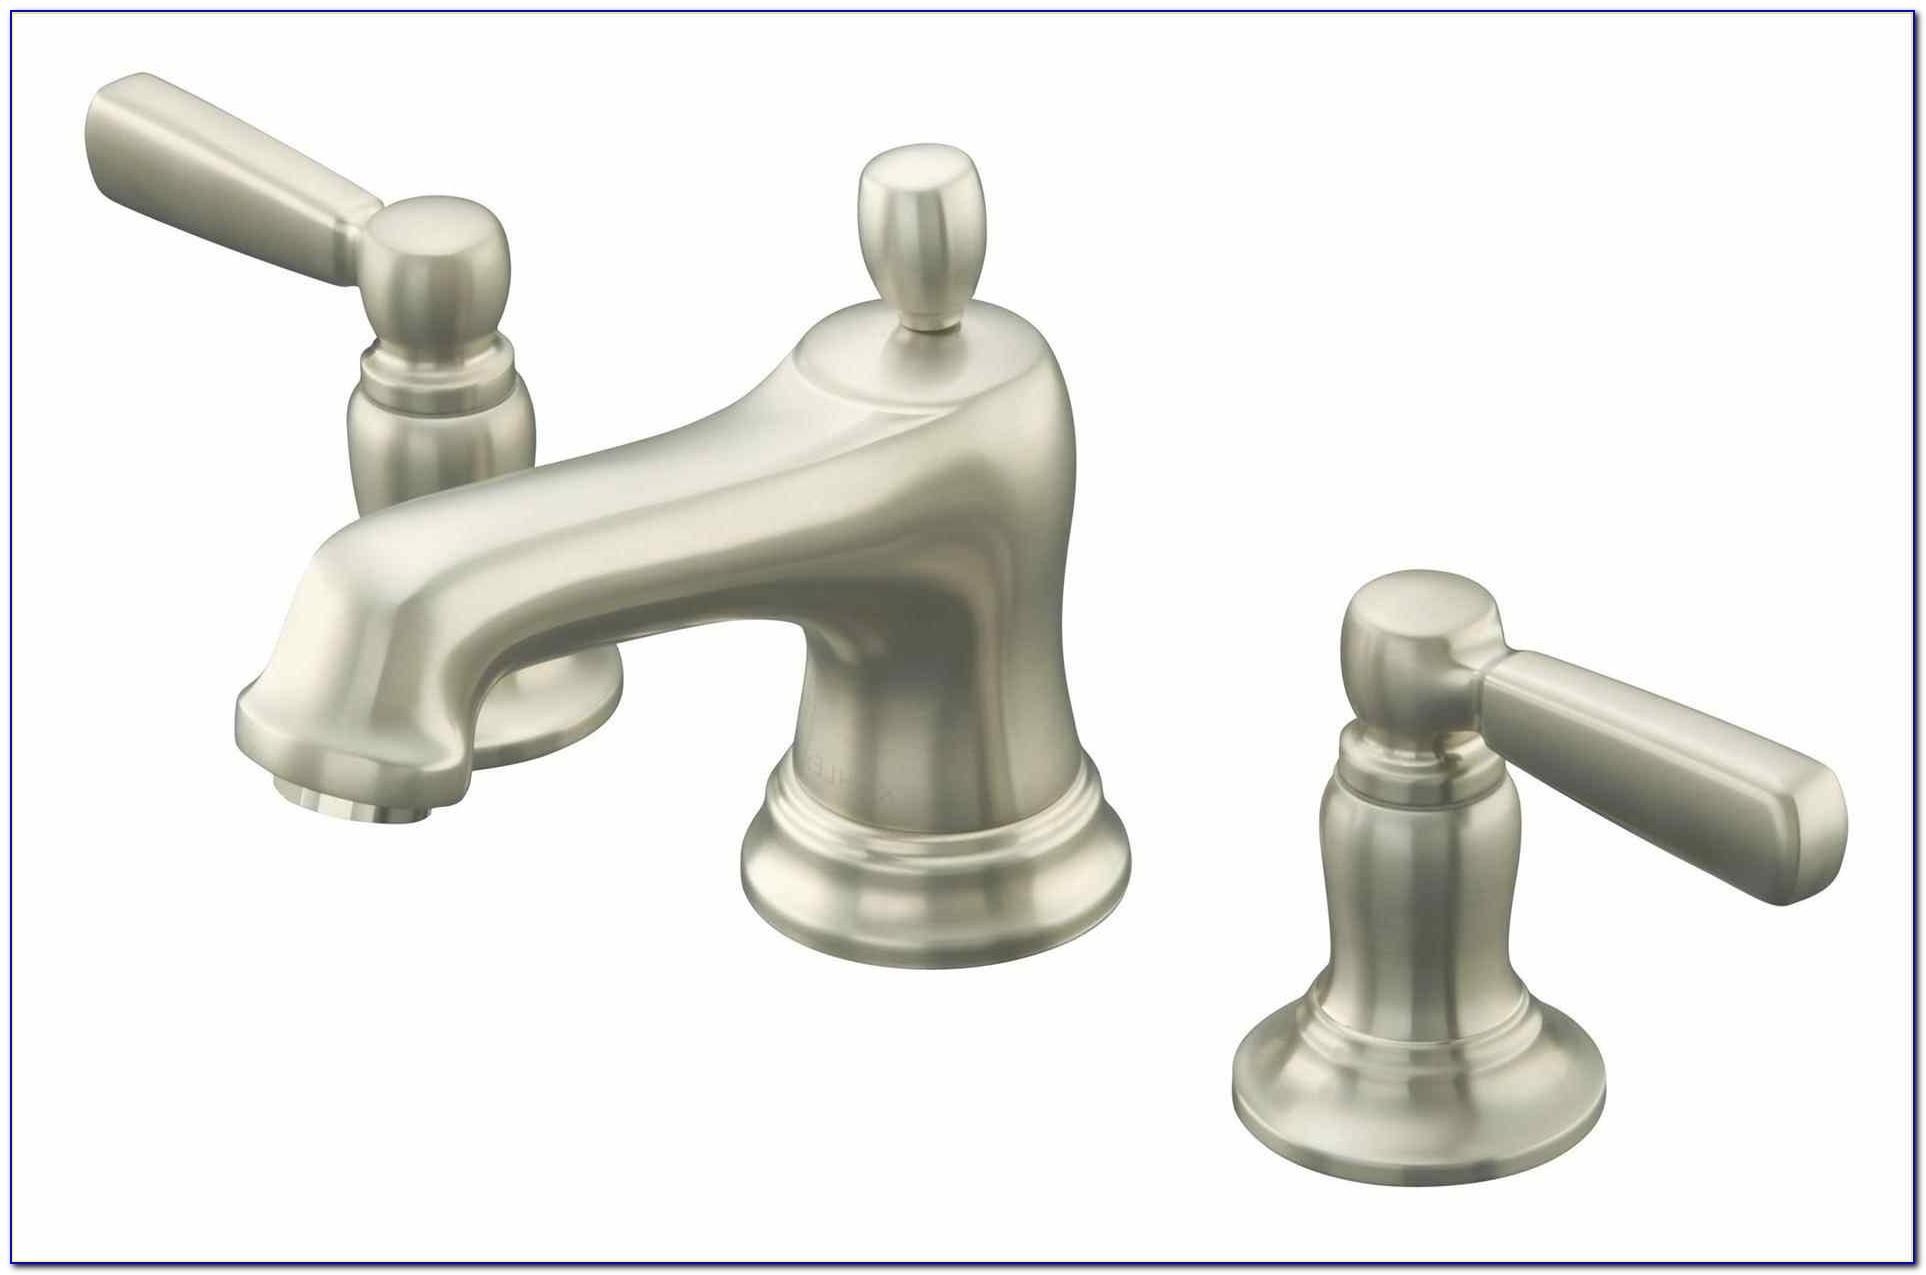 Moen Monticello Roman Tub Faucet Installation